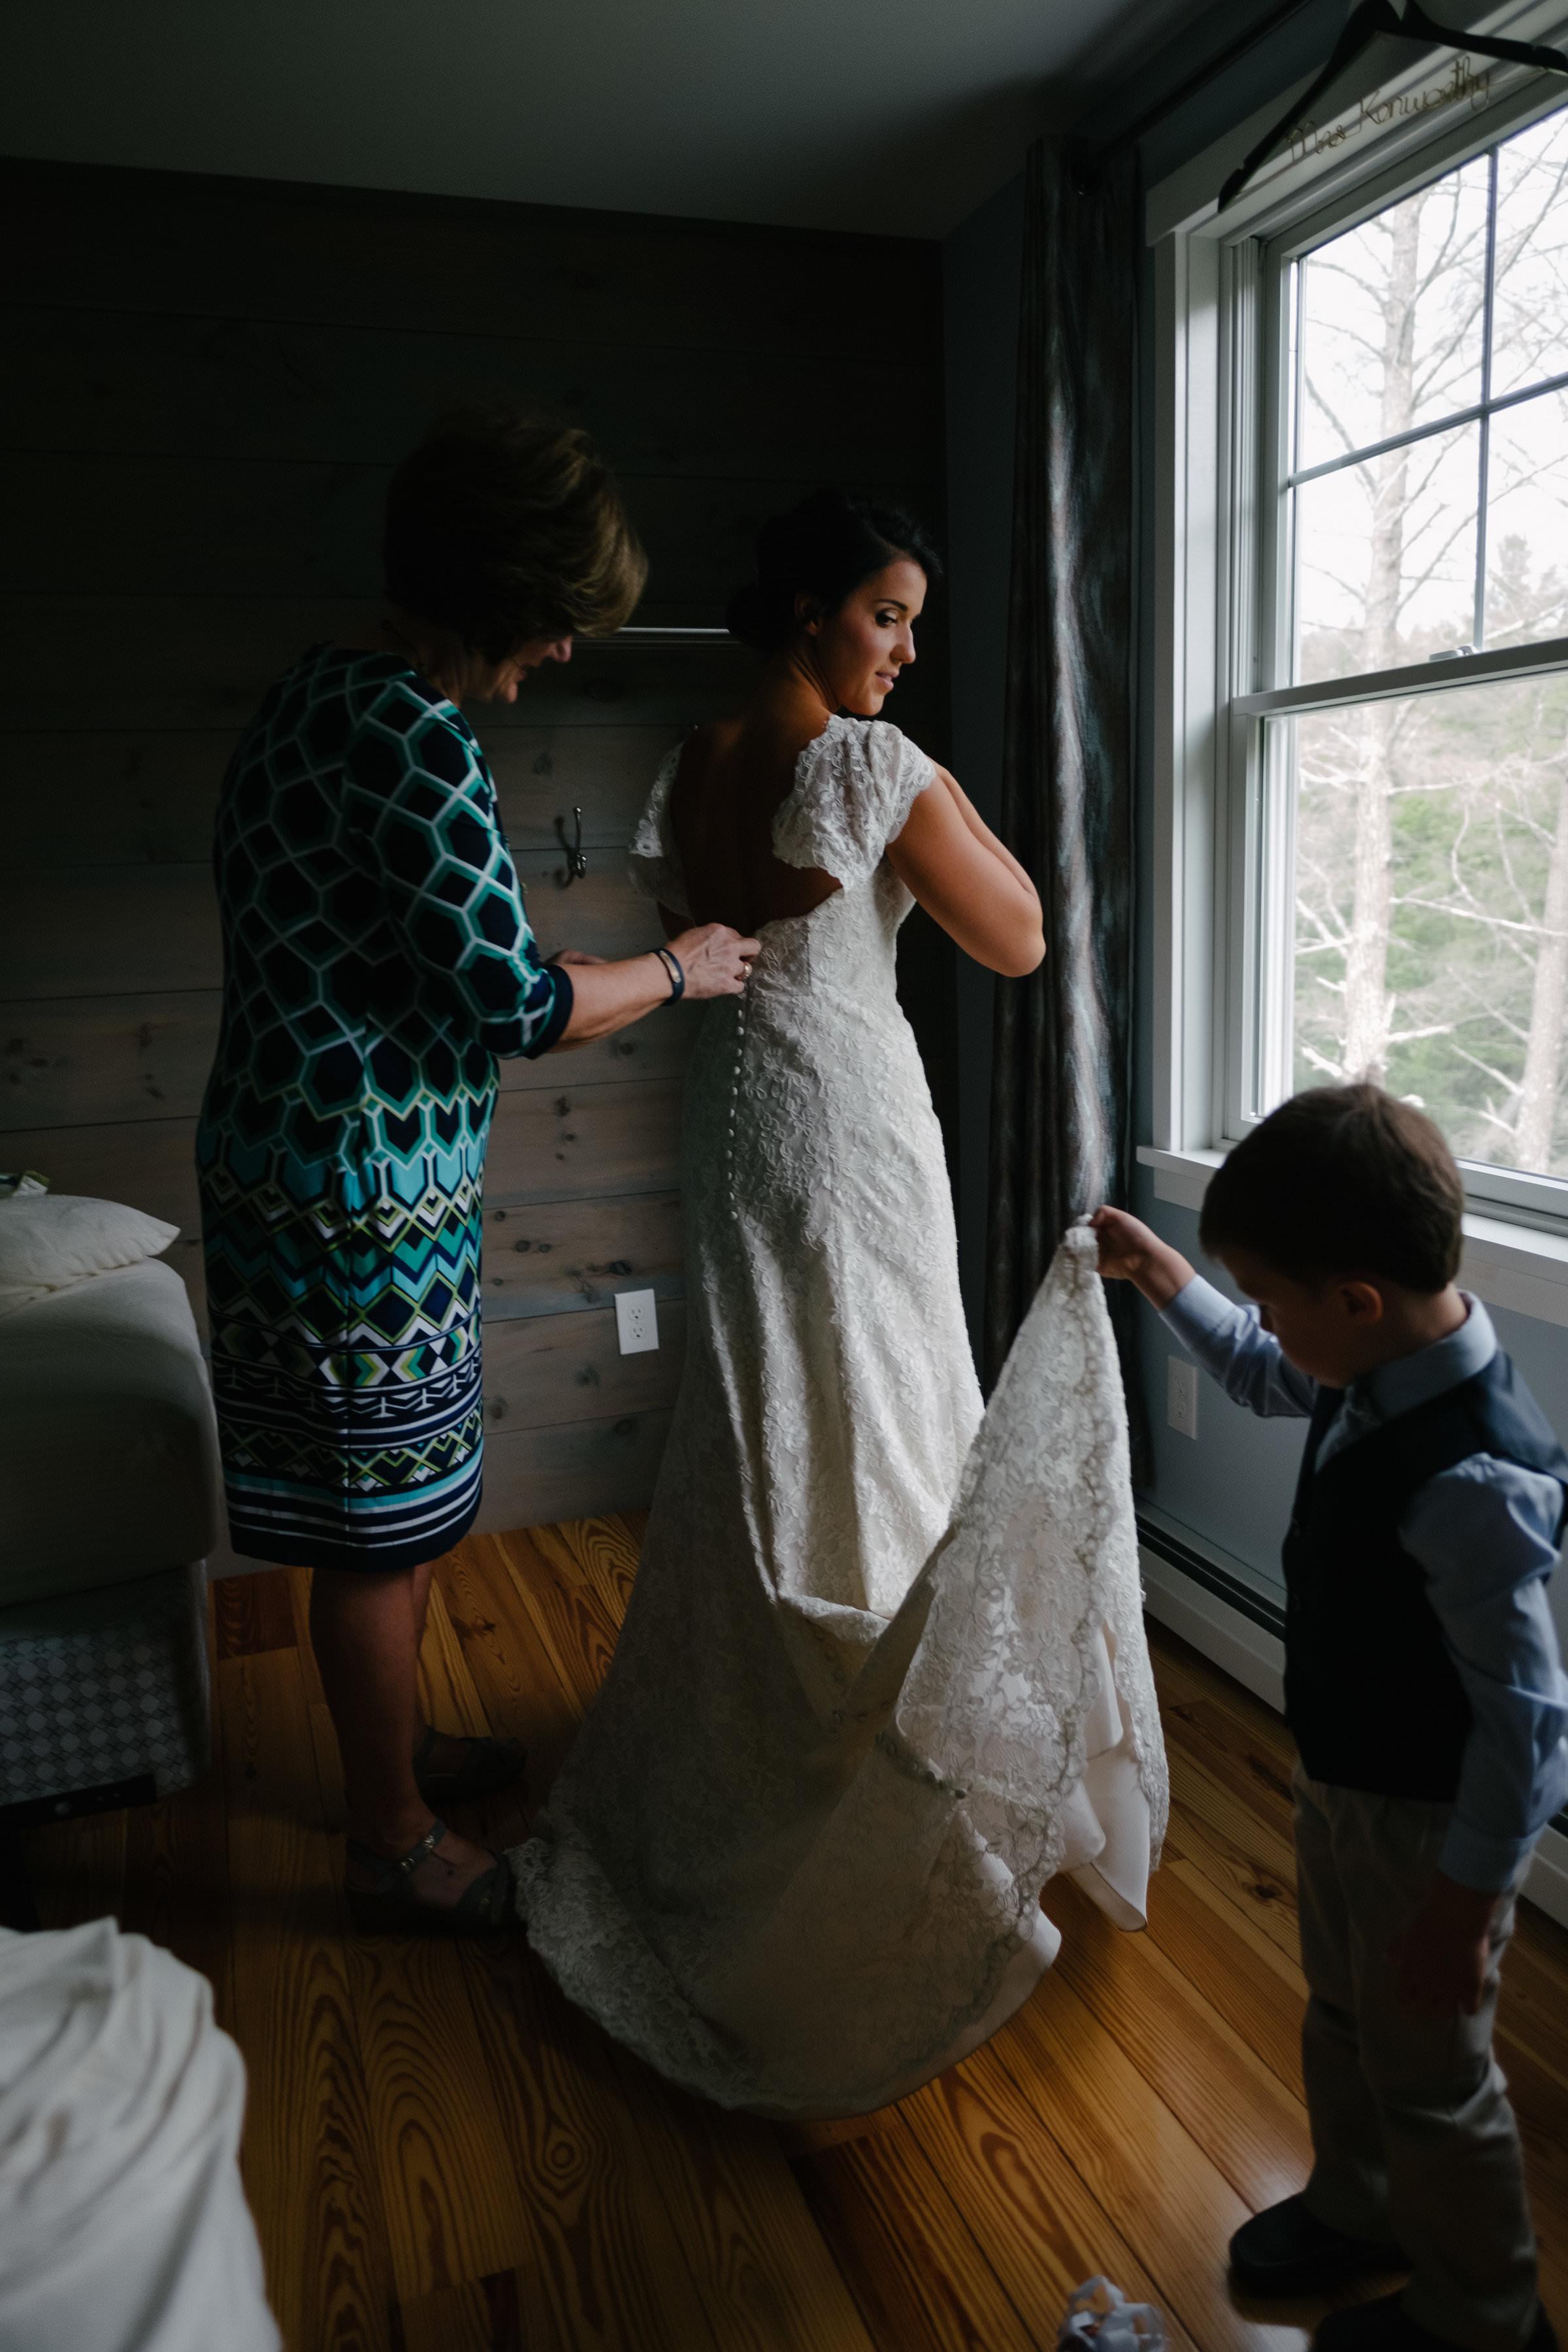 Vermont Wedding Photographer | Burke Mountain | Benjamin Hewitt Photography